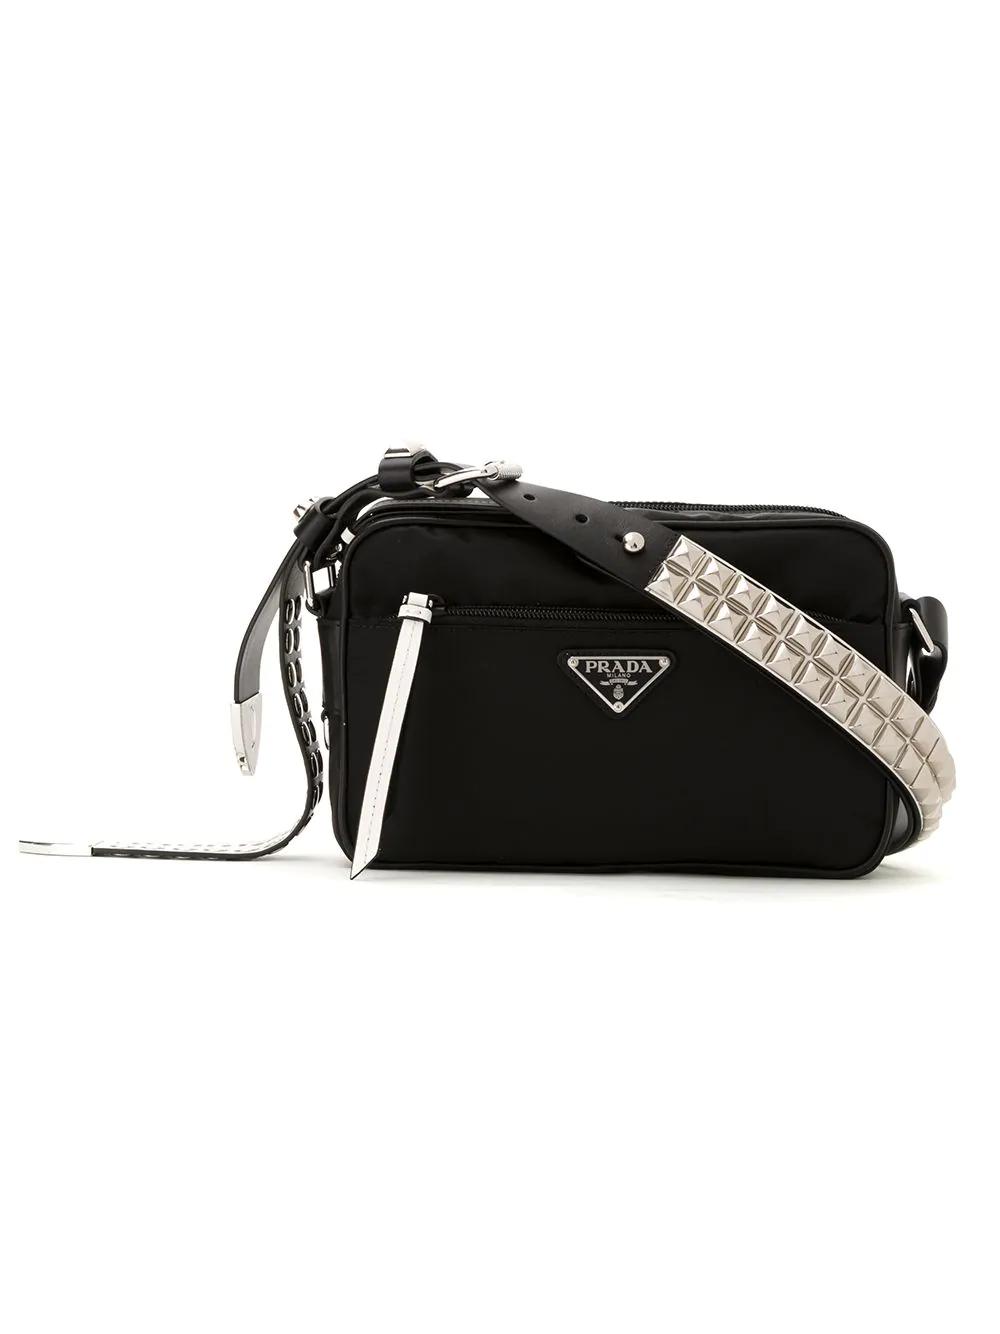 f1d634a0d2 Prada Nylon Shoulder Bag - Black In F0967 Black/White | ModeSens